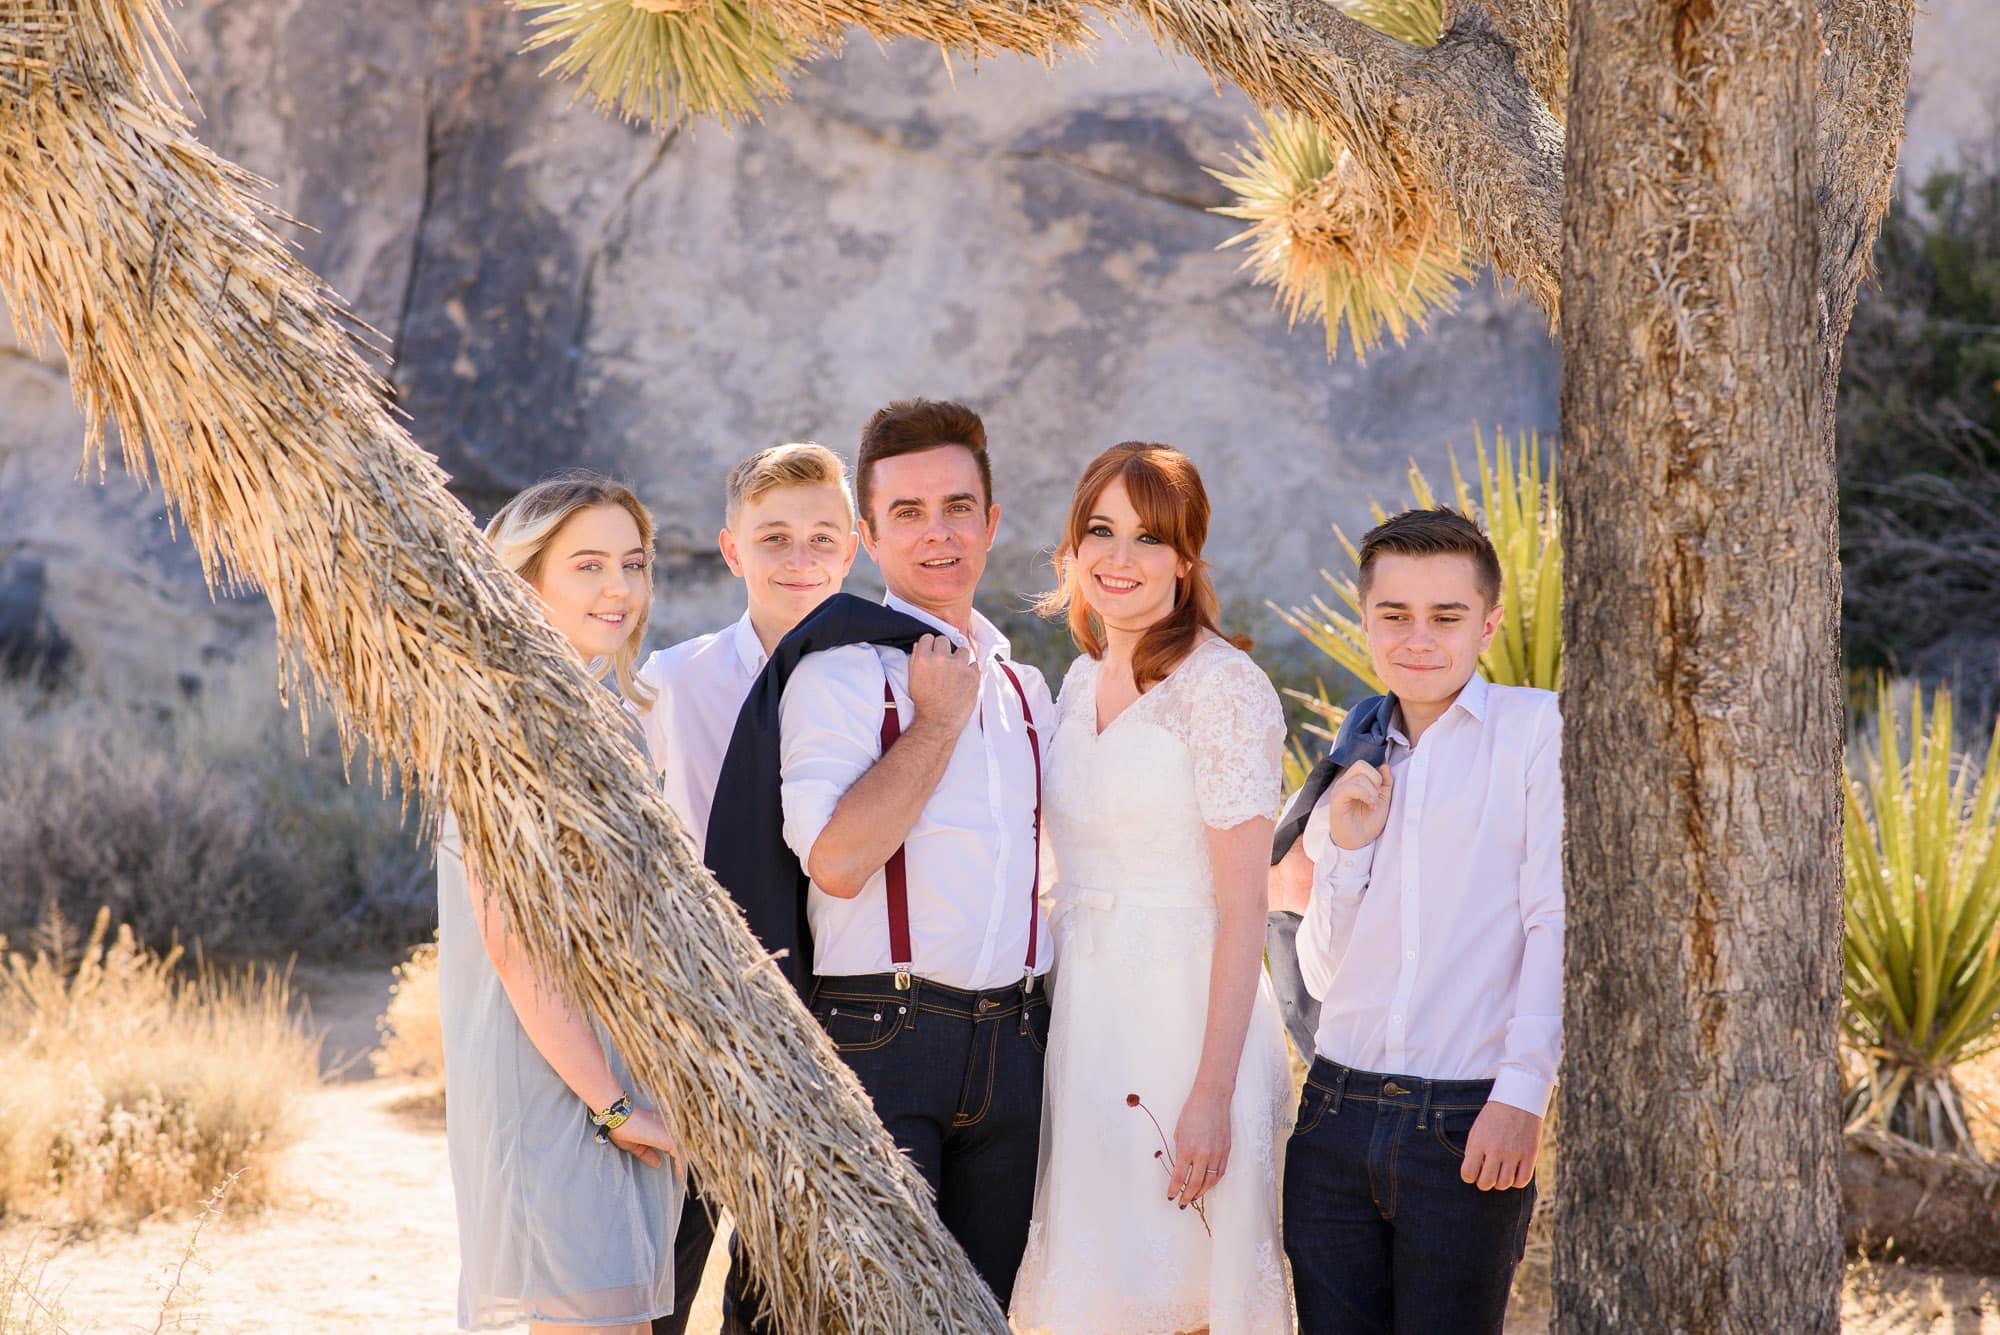 017_Alan_and_Heidi_Joshua_Tree_Destination_Wedding